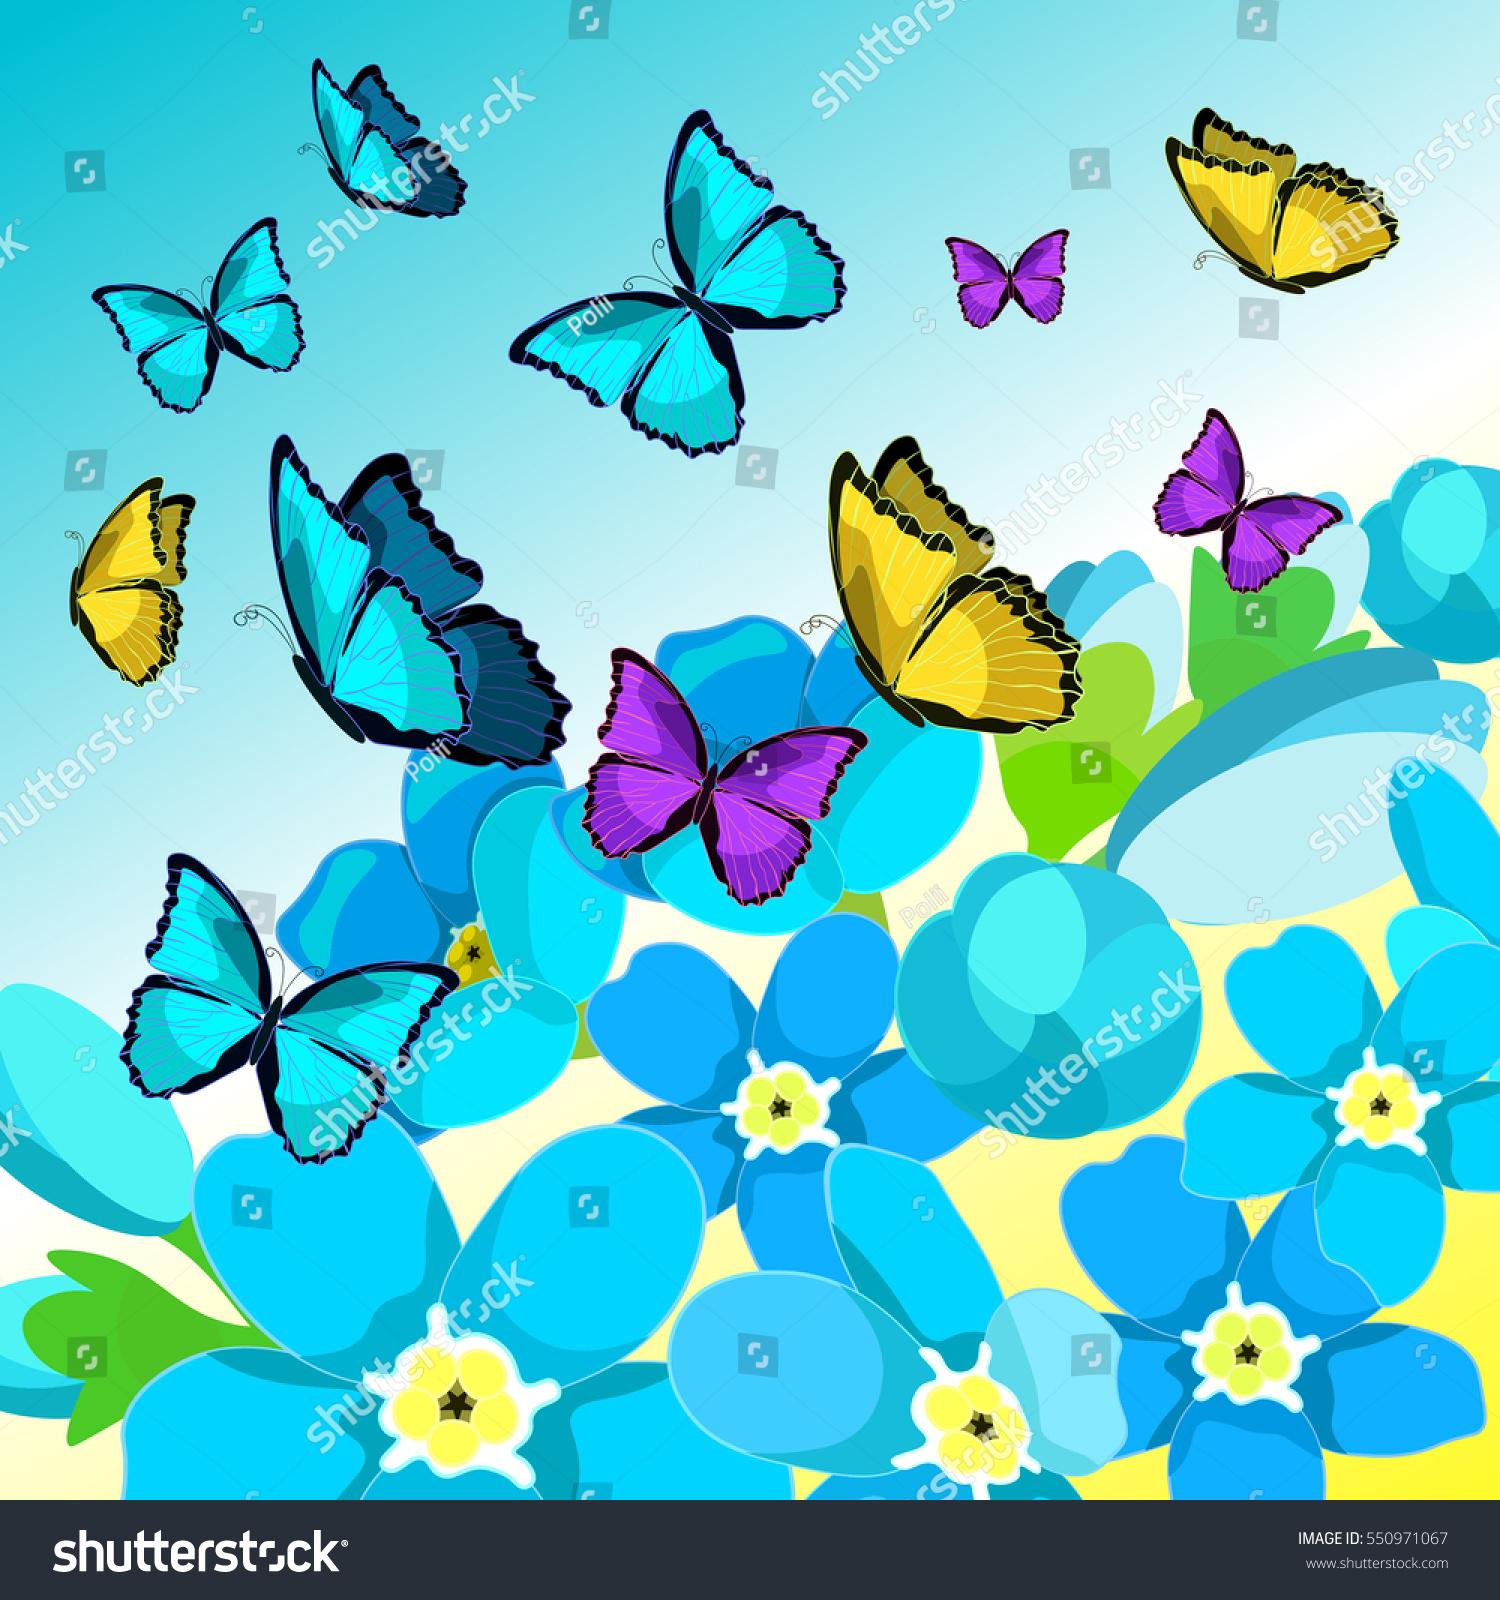 blue morpho butterfly monarch forgetmenot flowers stock vector 550971067 shutterstock. Black Bedroom Furniture Sets. Home Design Ideas